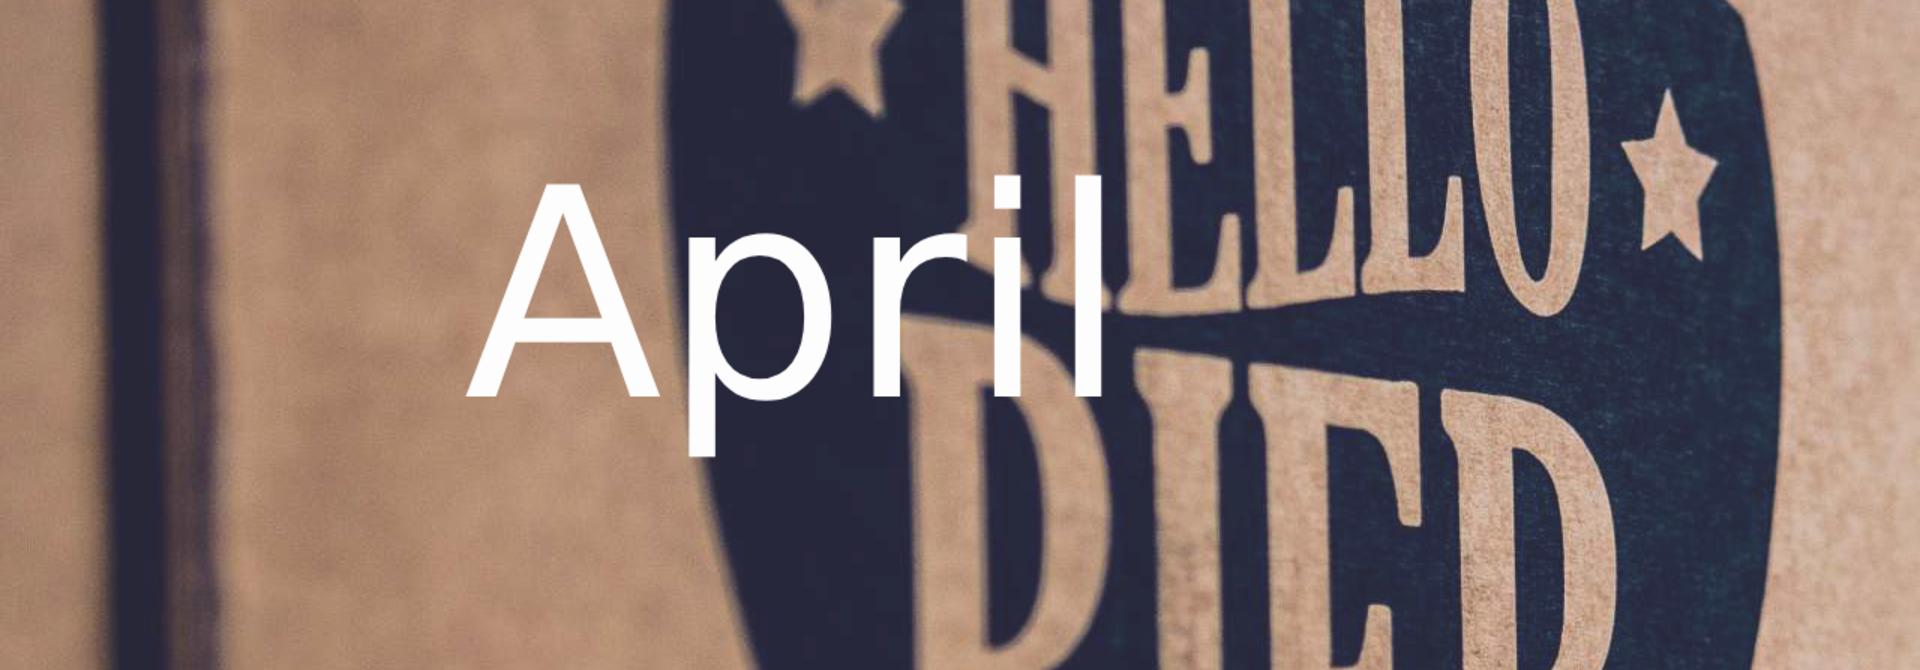 Speciaalbier – bierpakket april 2019